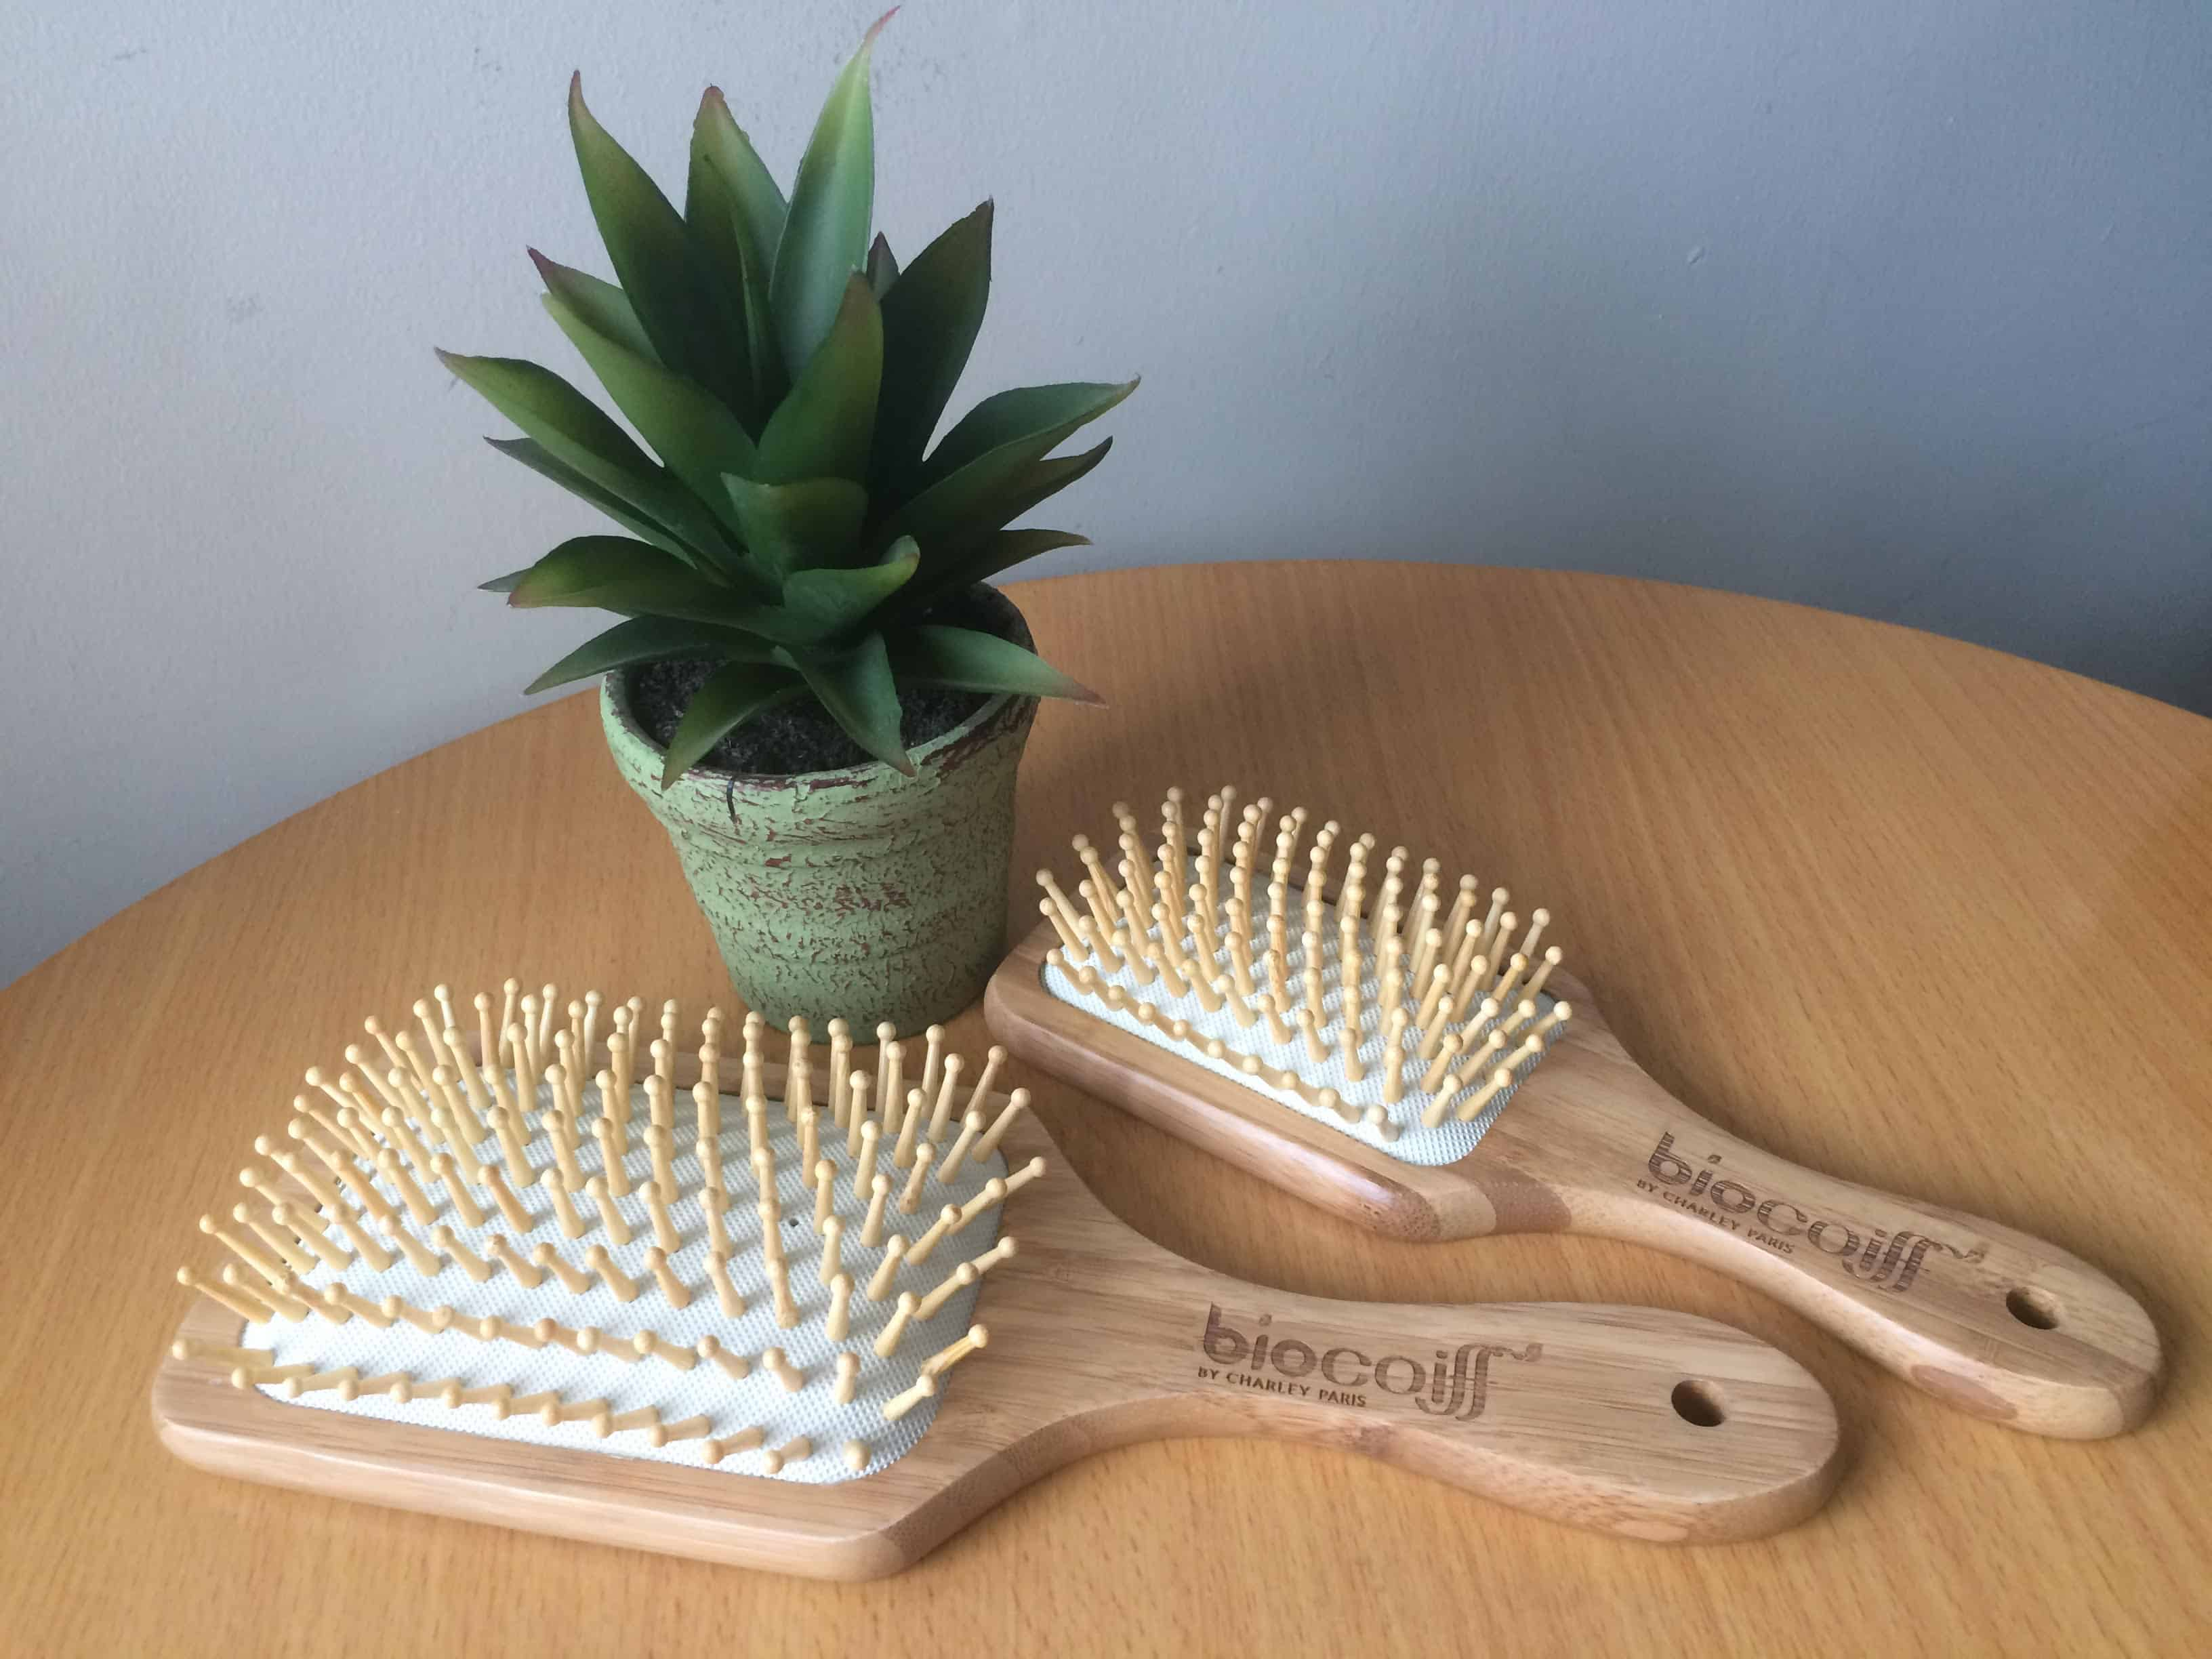 choisir brosse bois bambou vegan